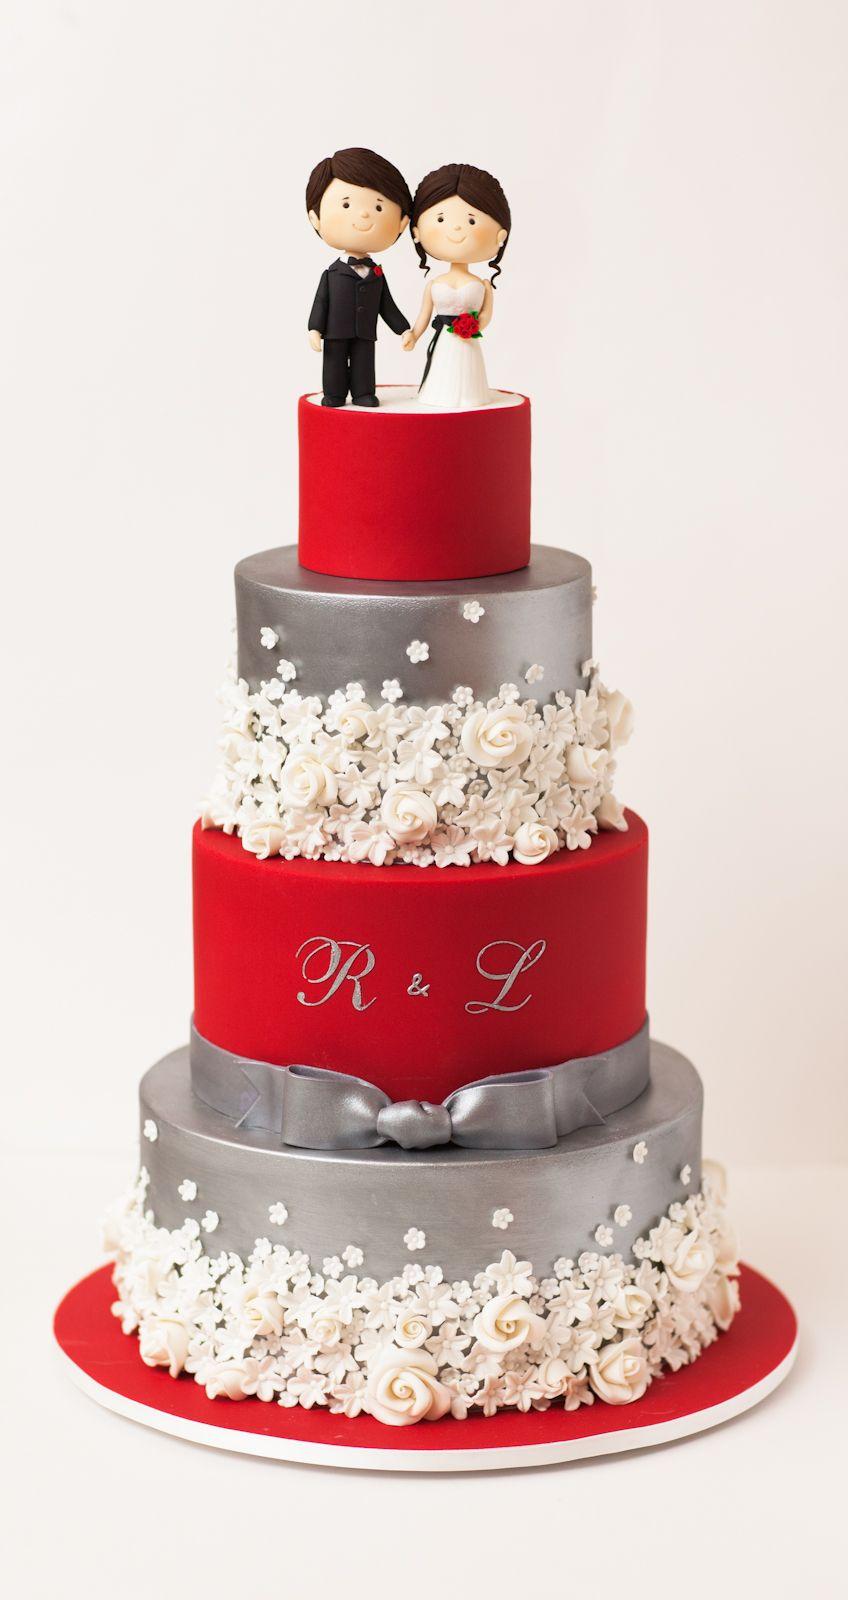 This is very ugo cougsu good for all the wsu weddings cake